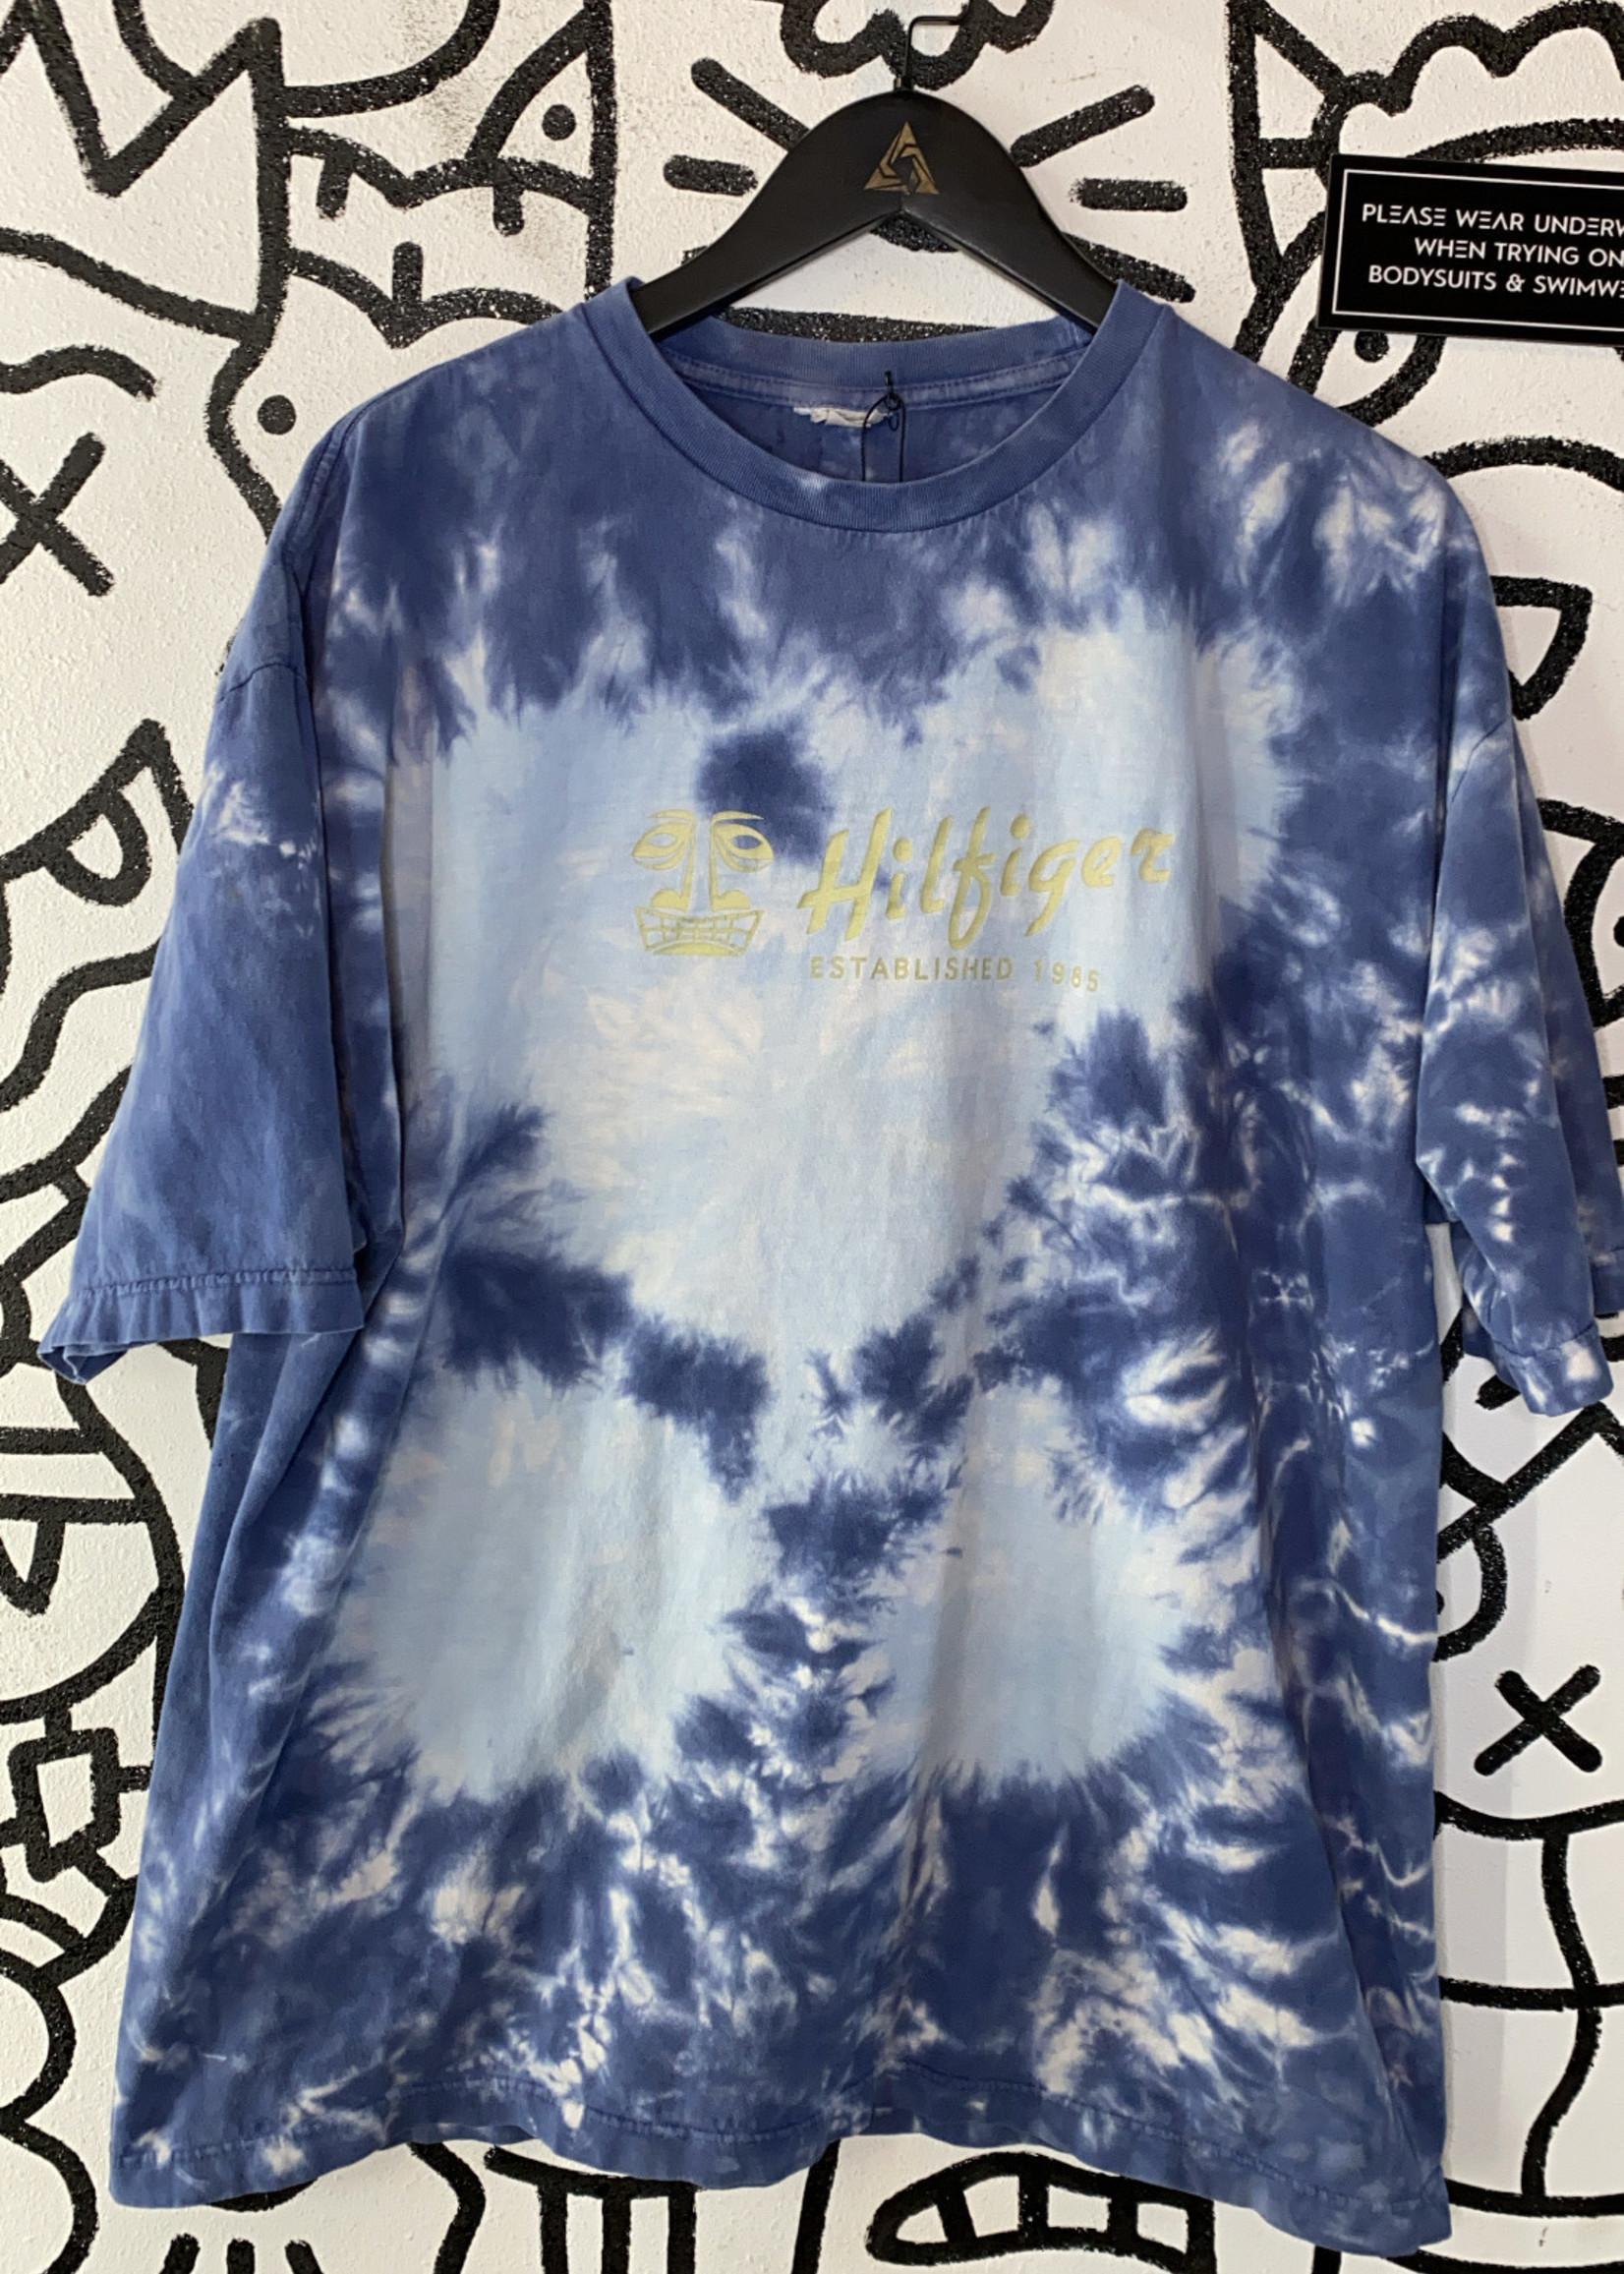 Hilfiger Tie Dye Blue Tee XL